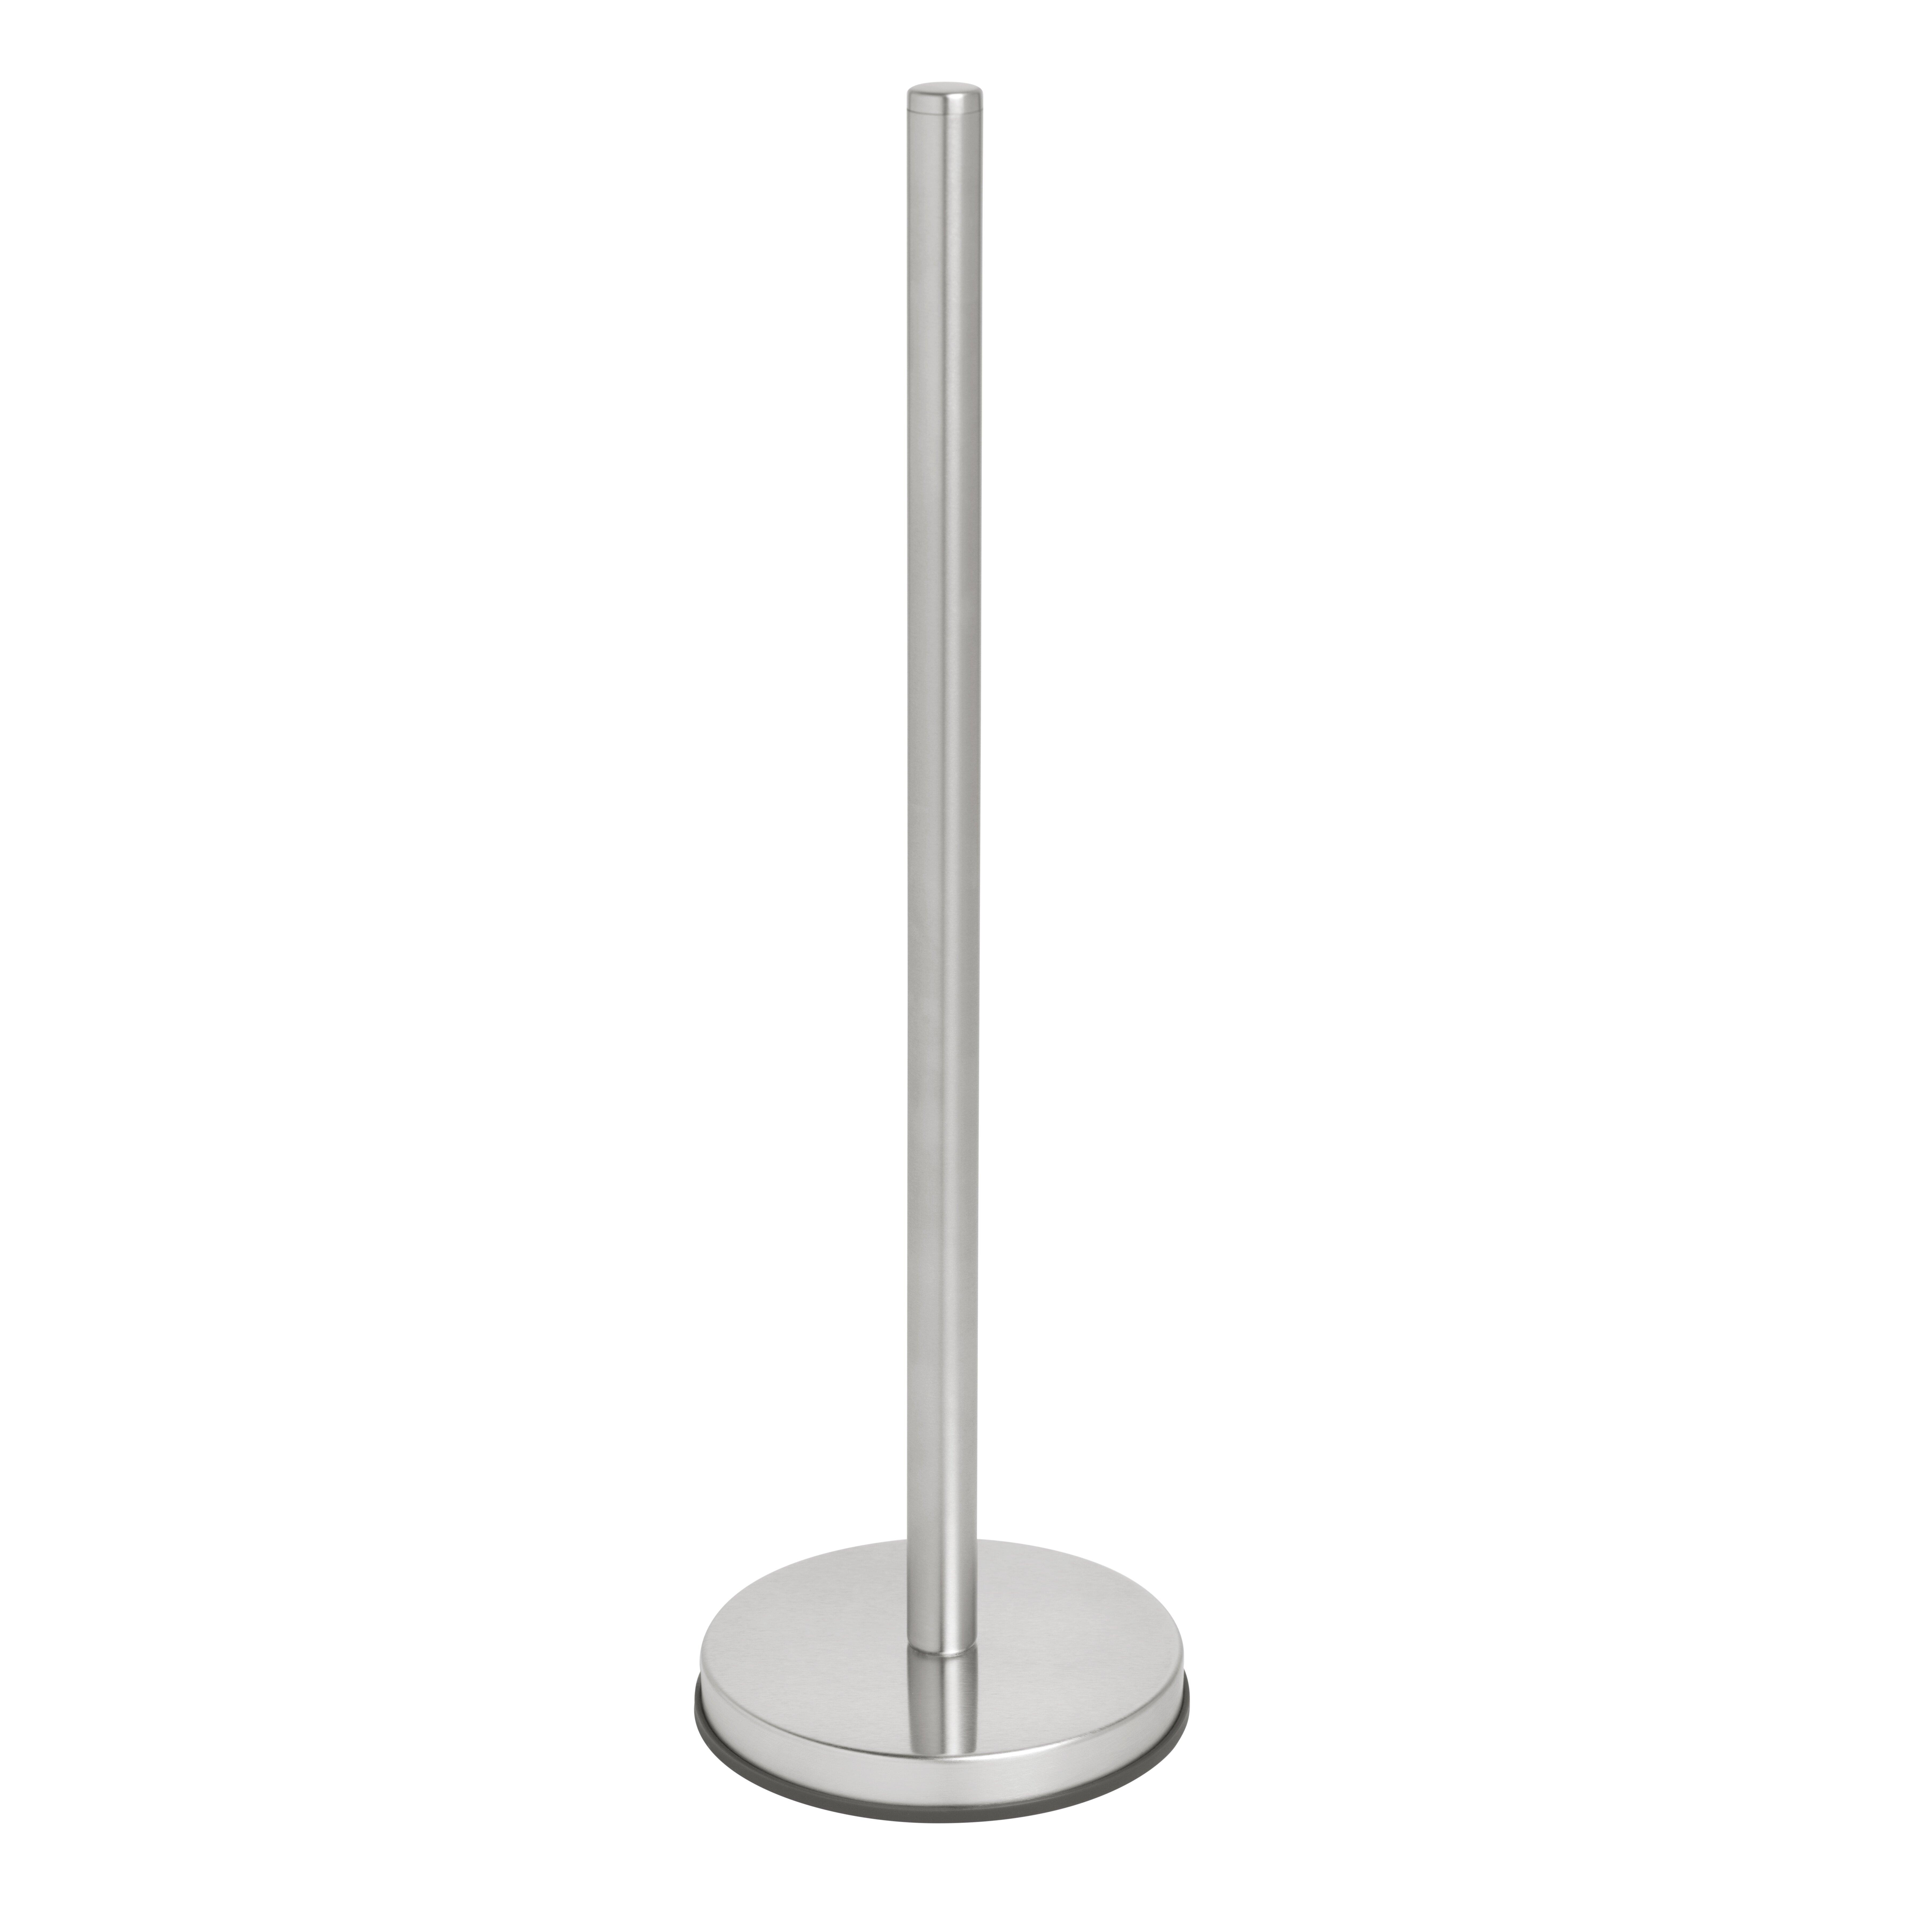 Tiger miscellaneous freestanding toilet roll holder Glass toilet roll holder